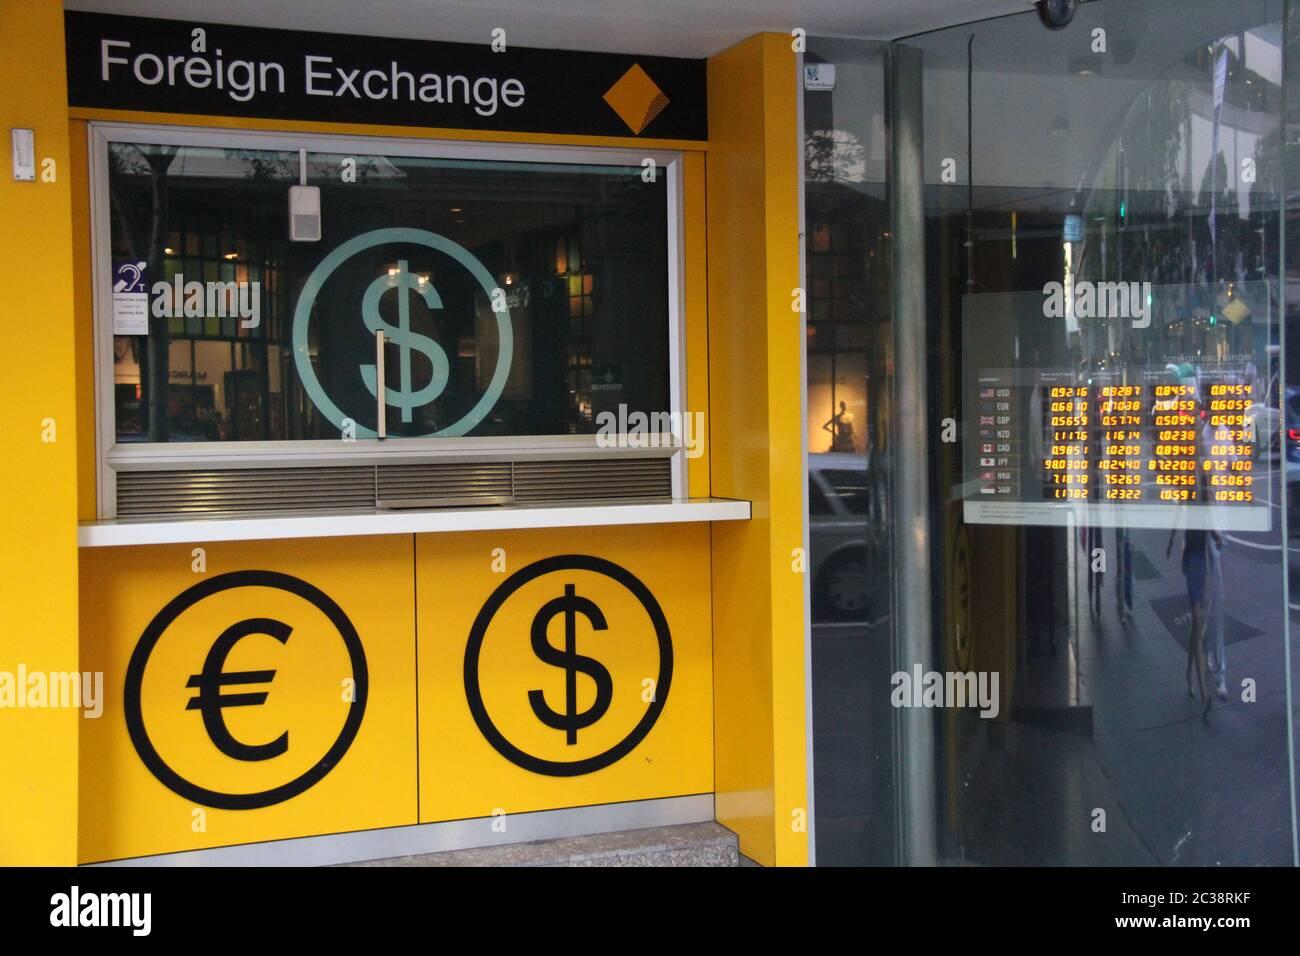 cth bank of australia forex